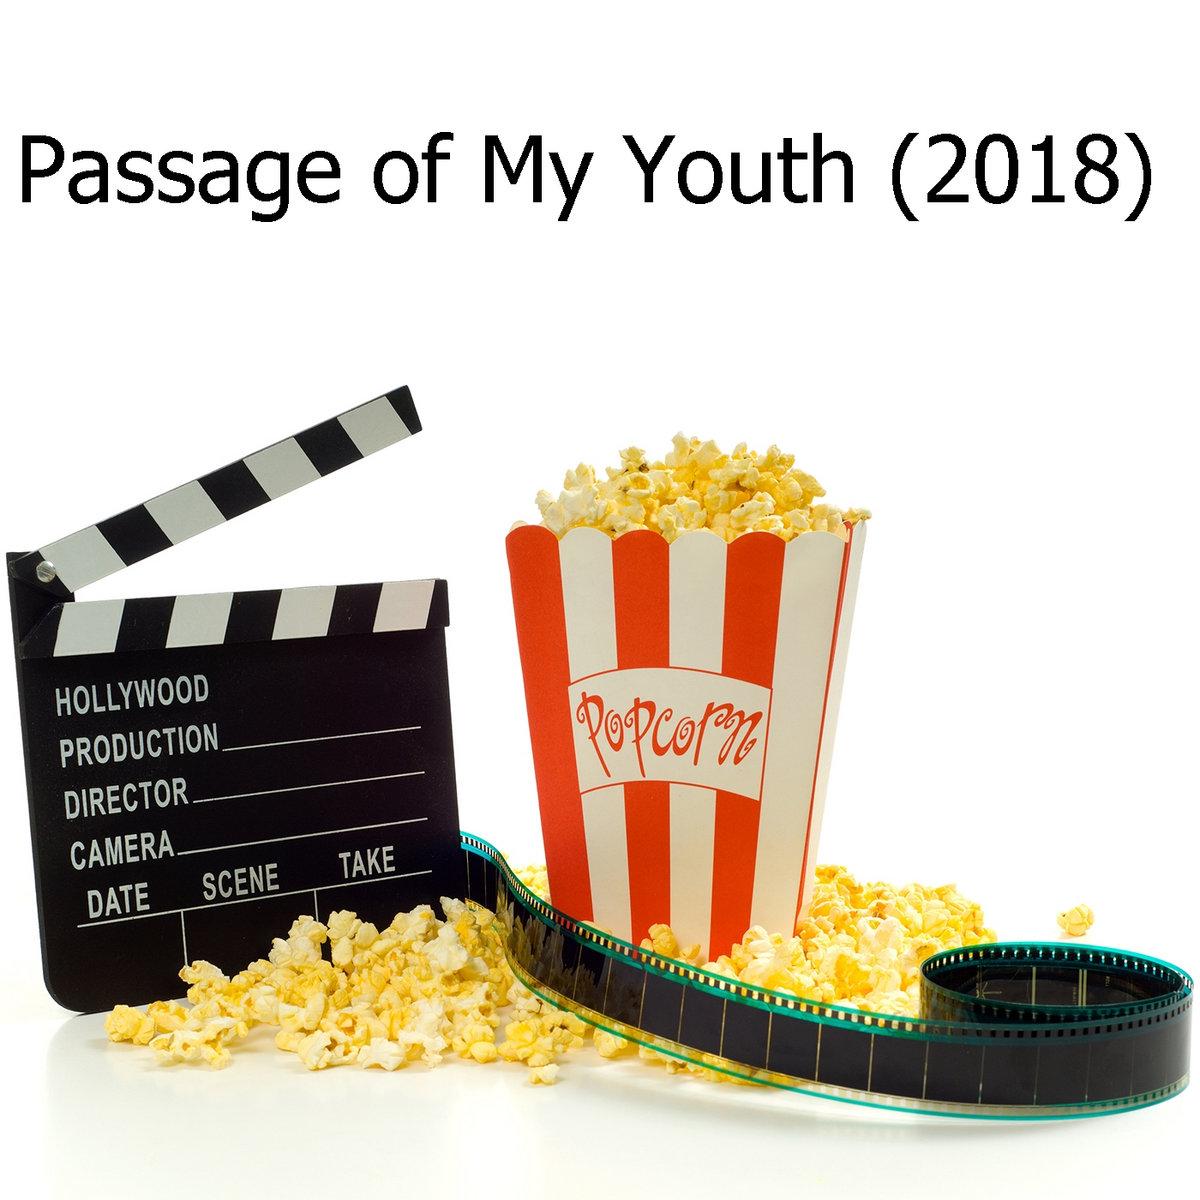 Full Passage Of My Youth Online Film Download 720p Hq Globisfilrene